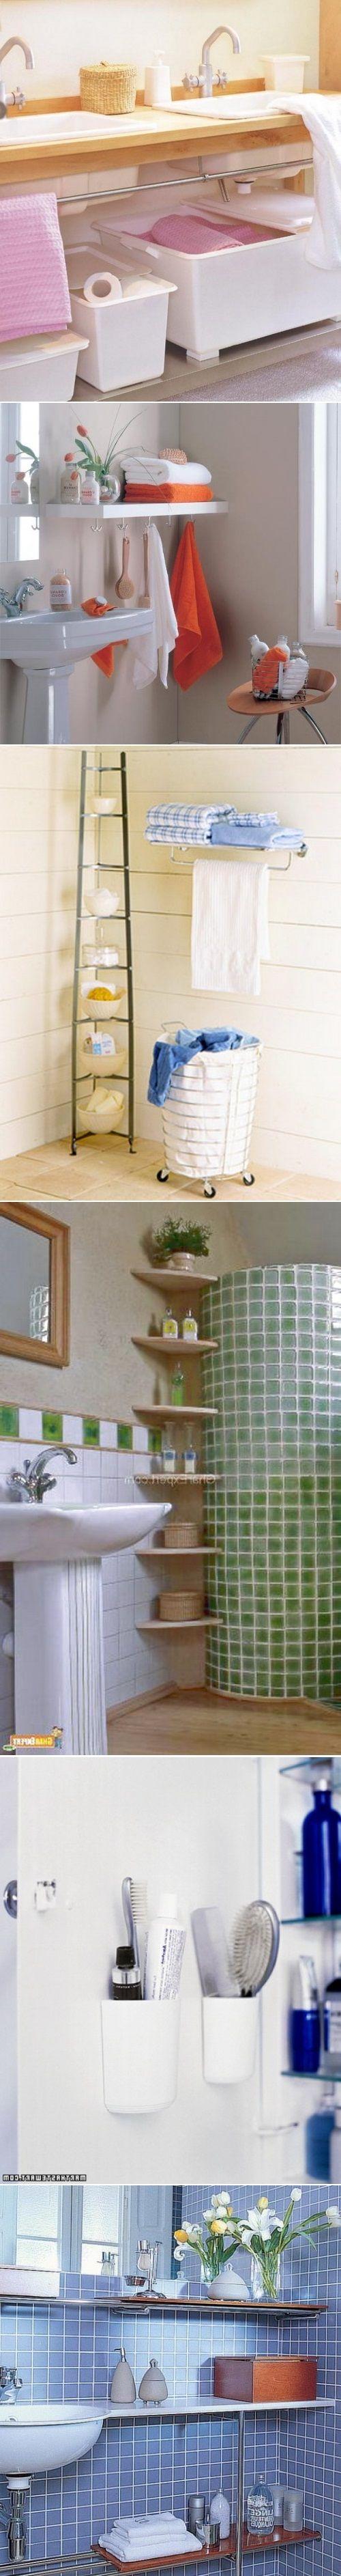 diy small bathroom storage ideas home pinterest